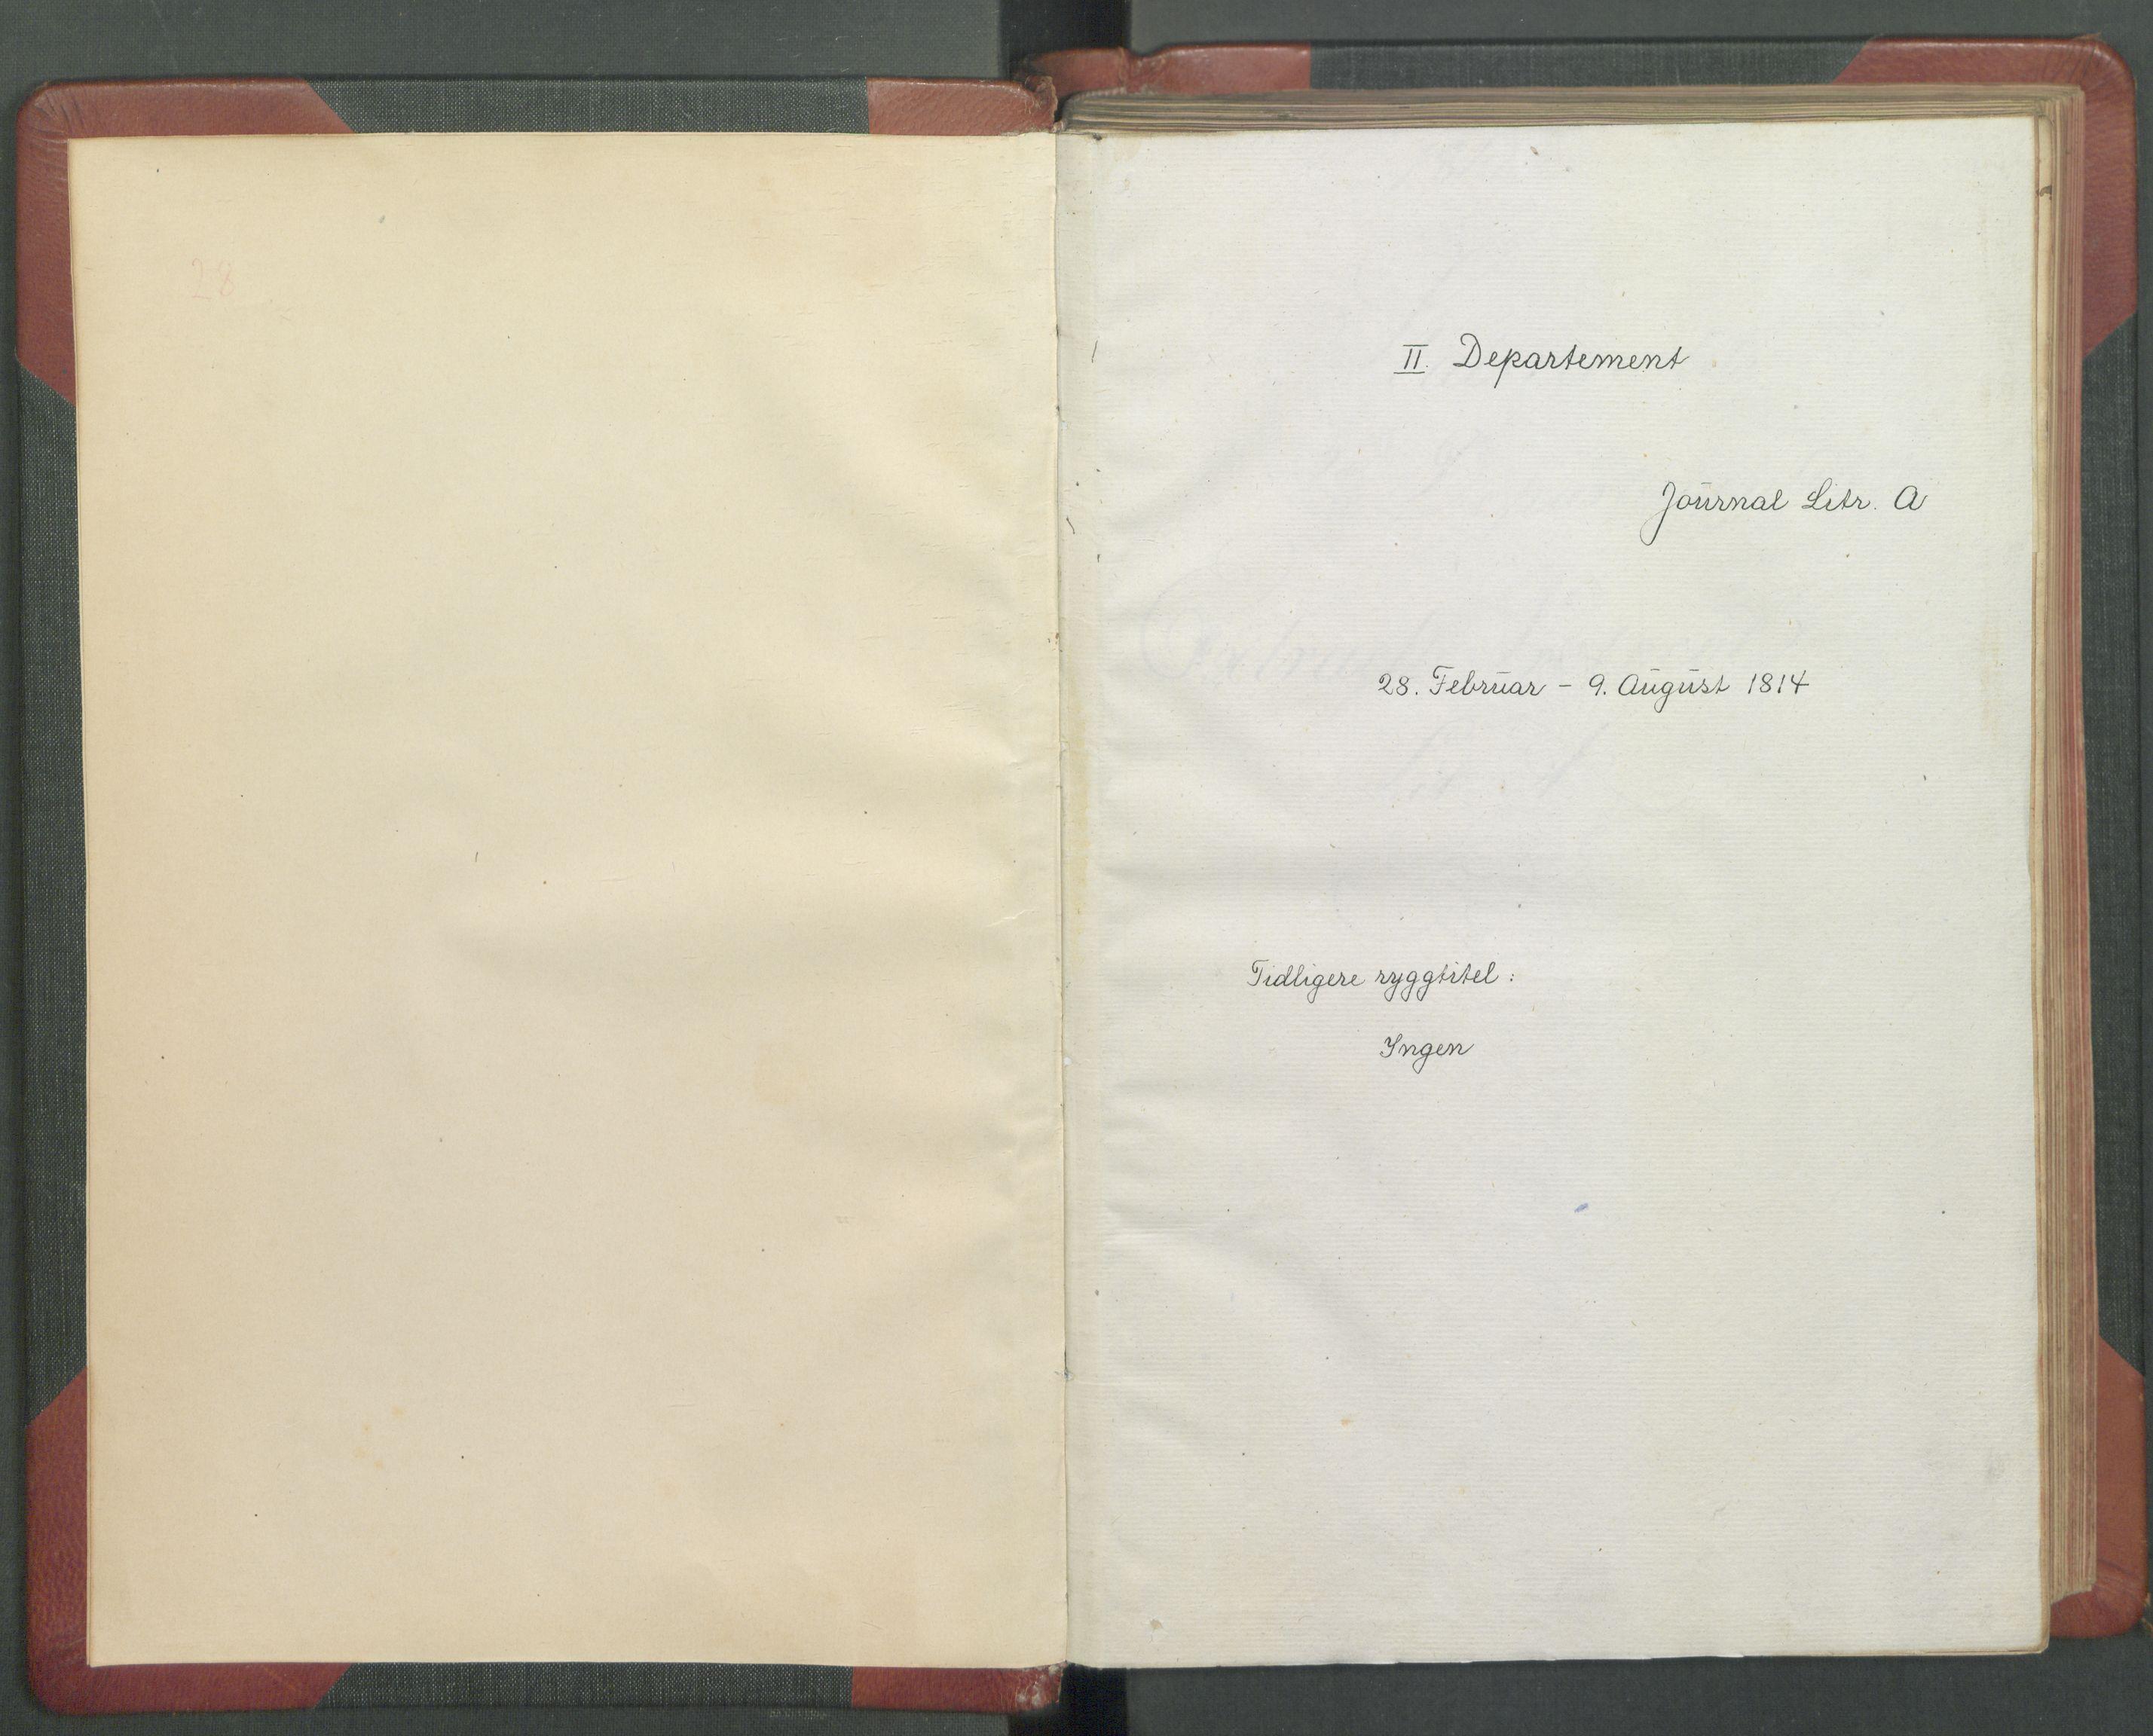 RA, Departementene i 1814, Fb/L0029: Journal A 1-900 (ekstraktprotokoll), 1814